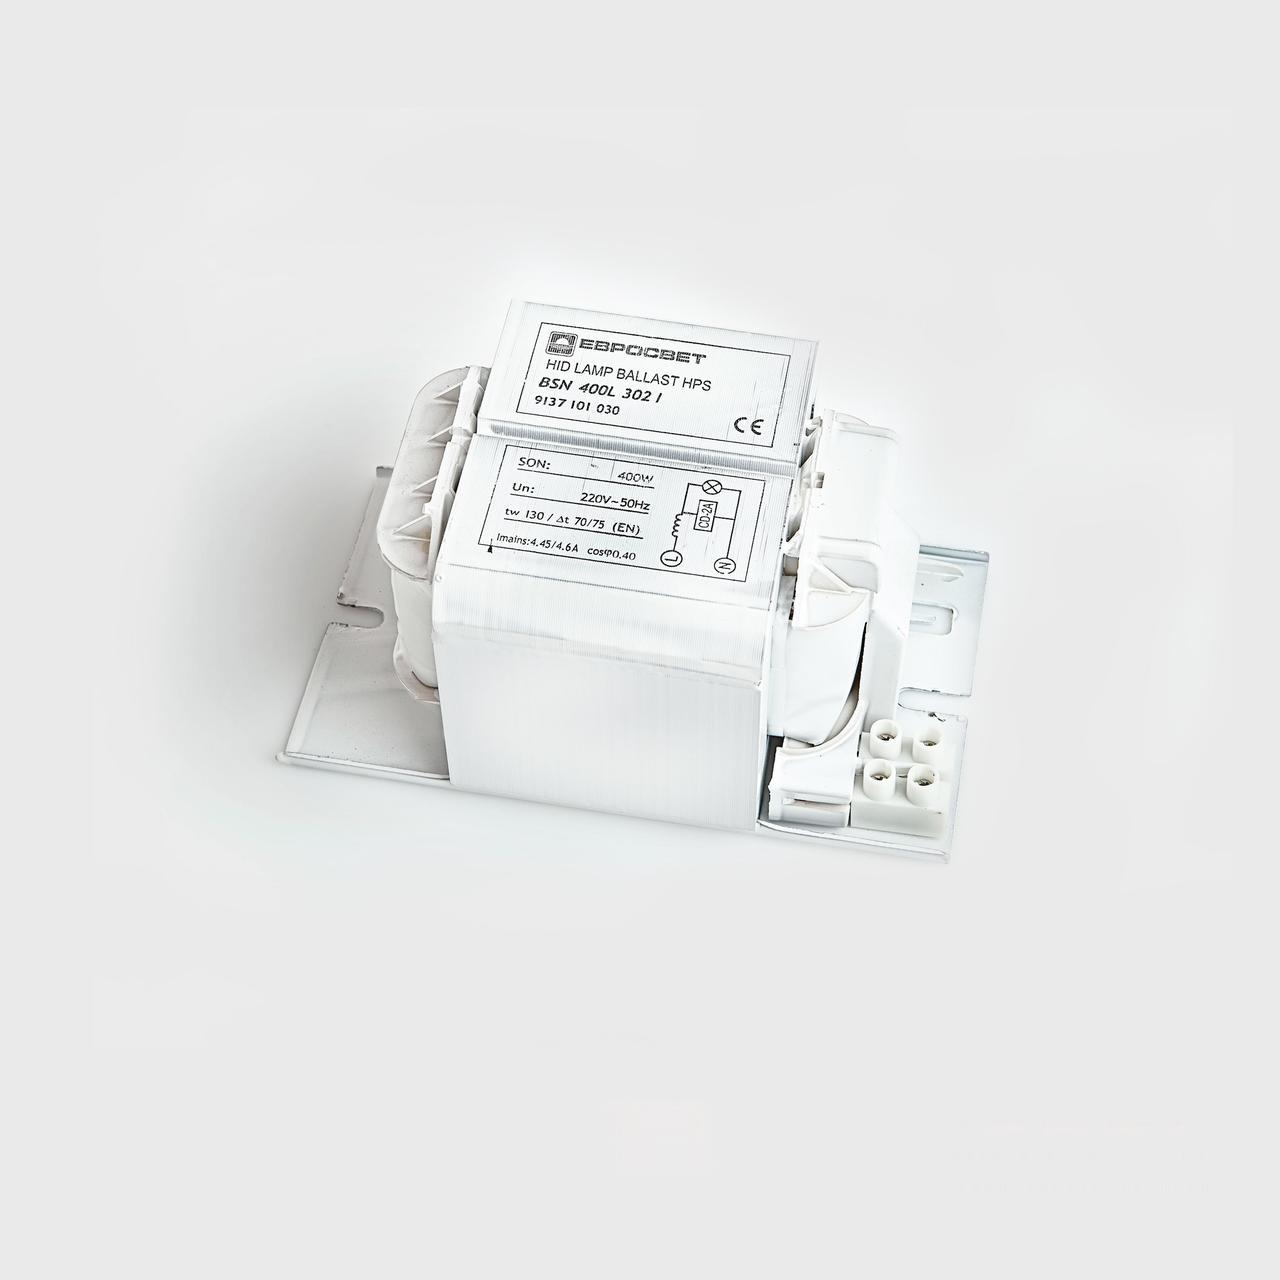 Балласт под натриевую лампу ДНаТ 400Вт